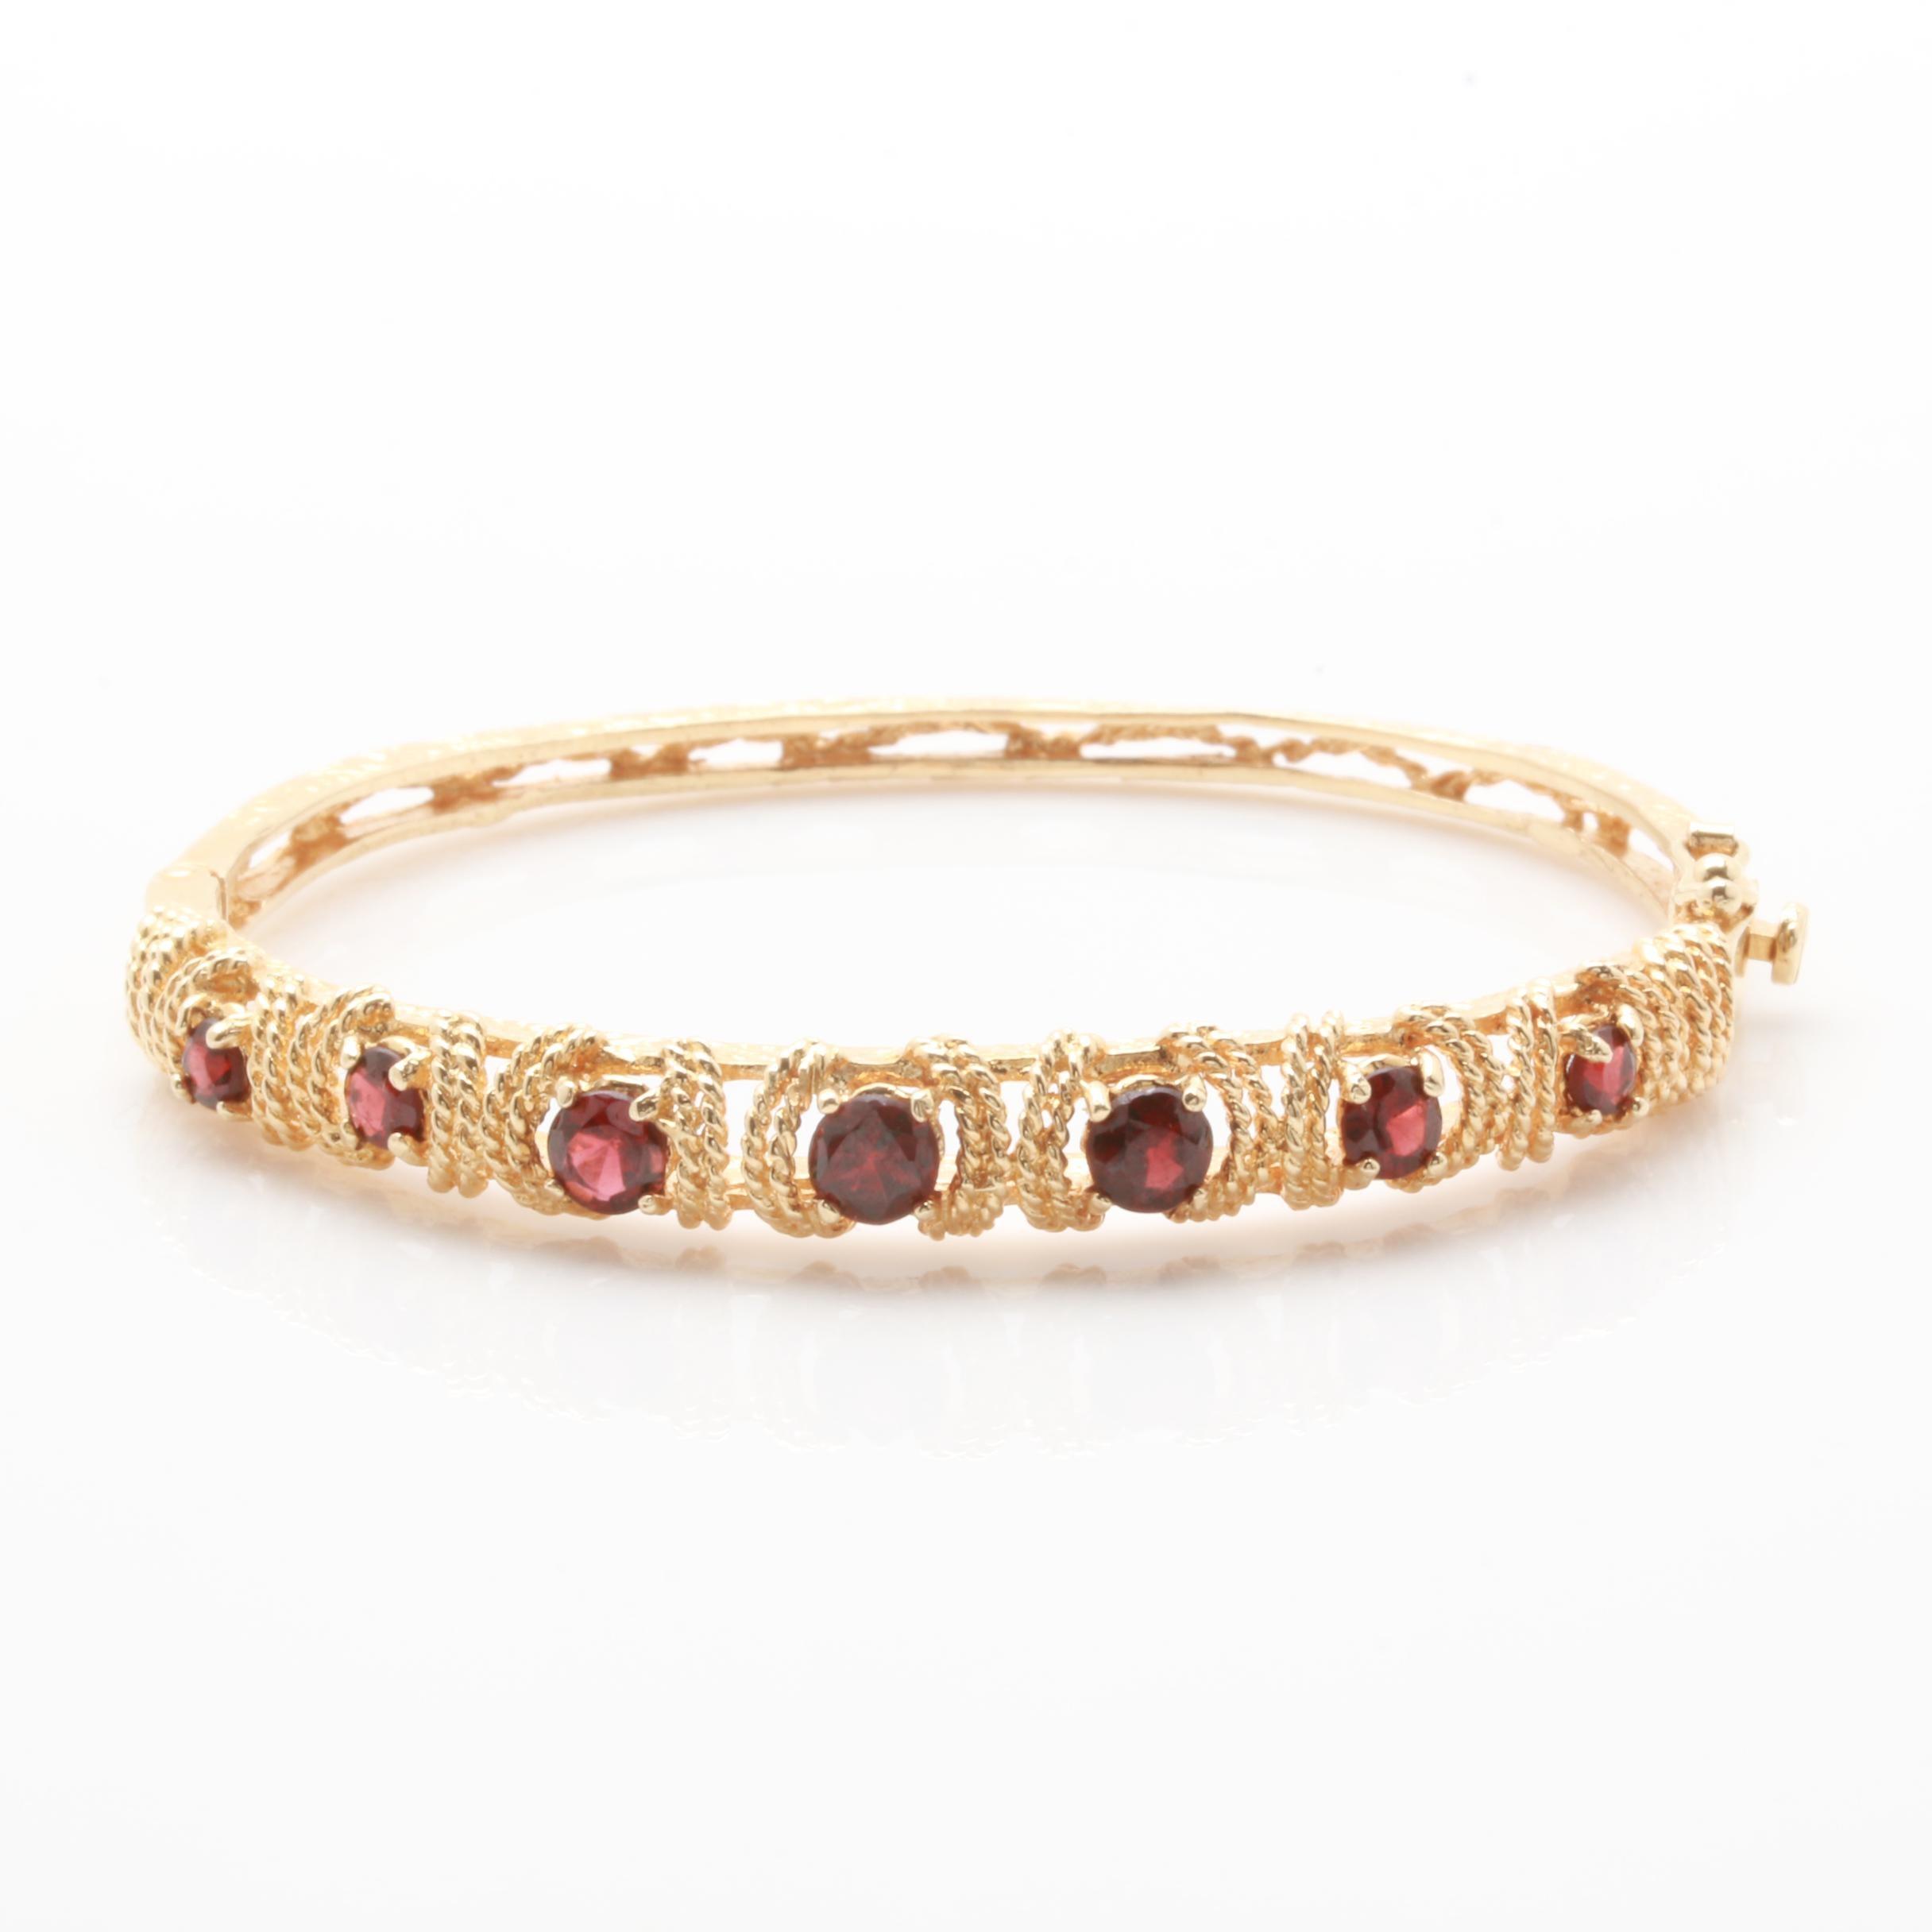 14K Yellow Gold Garnet Bangle Bracelet